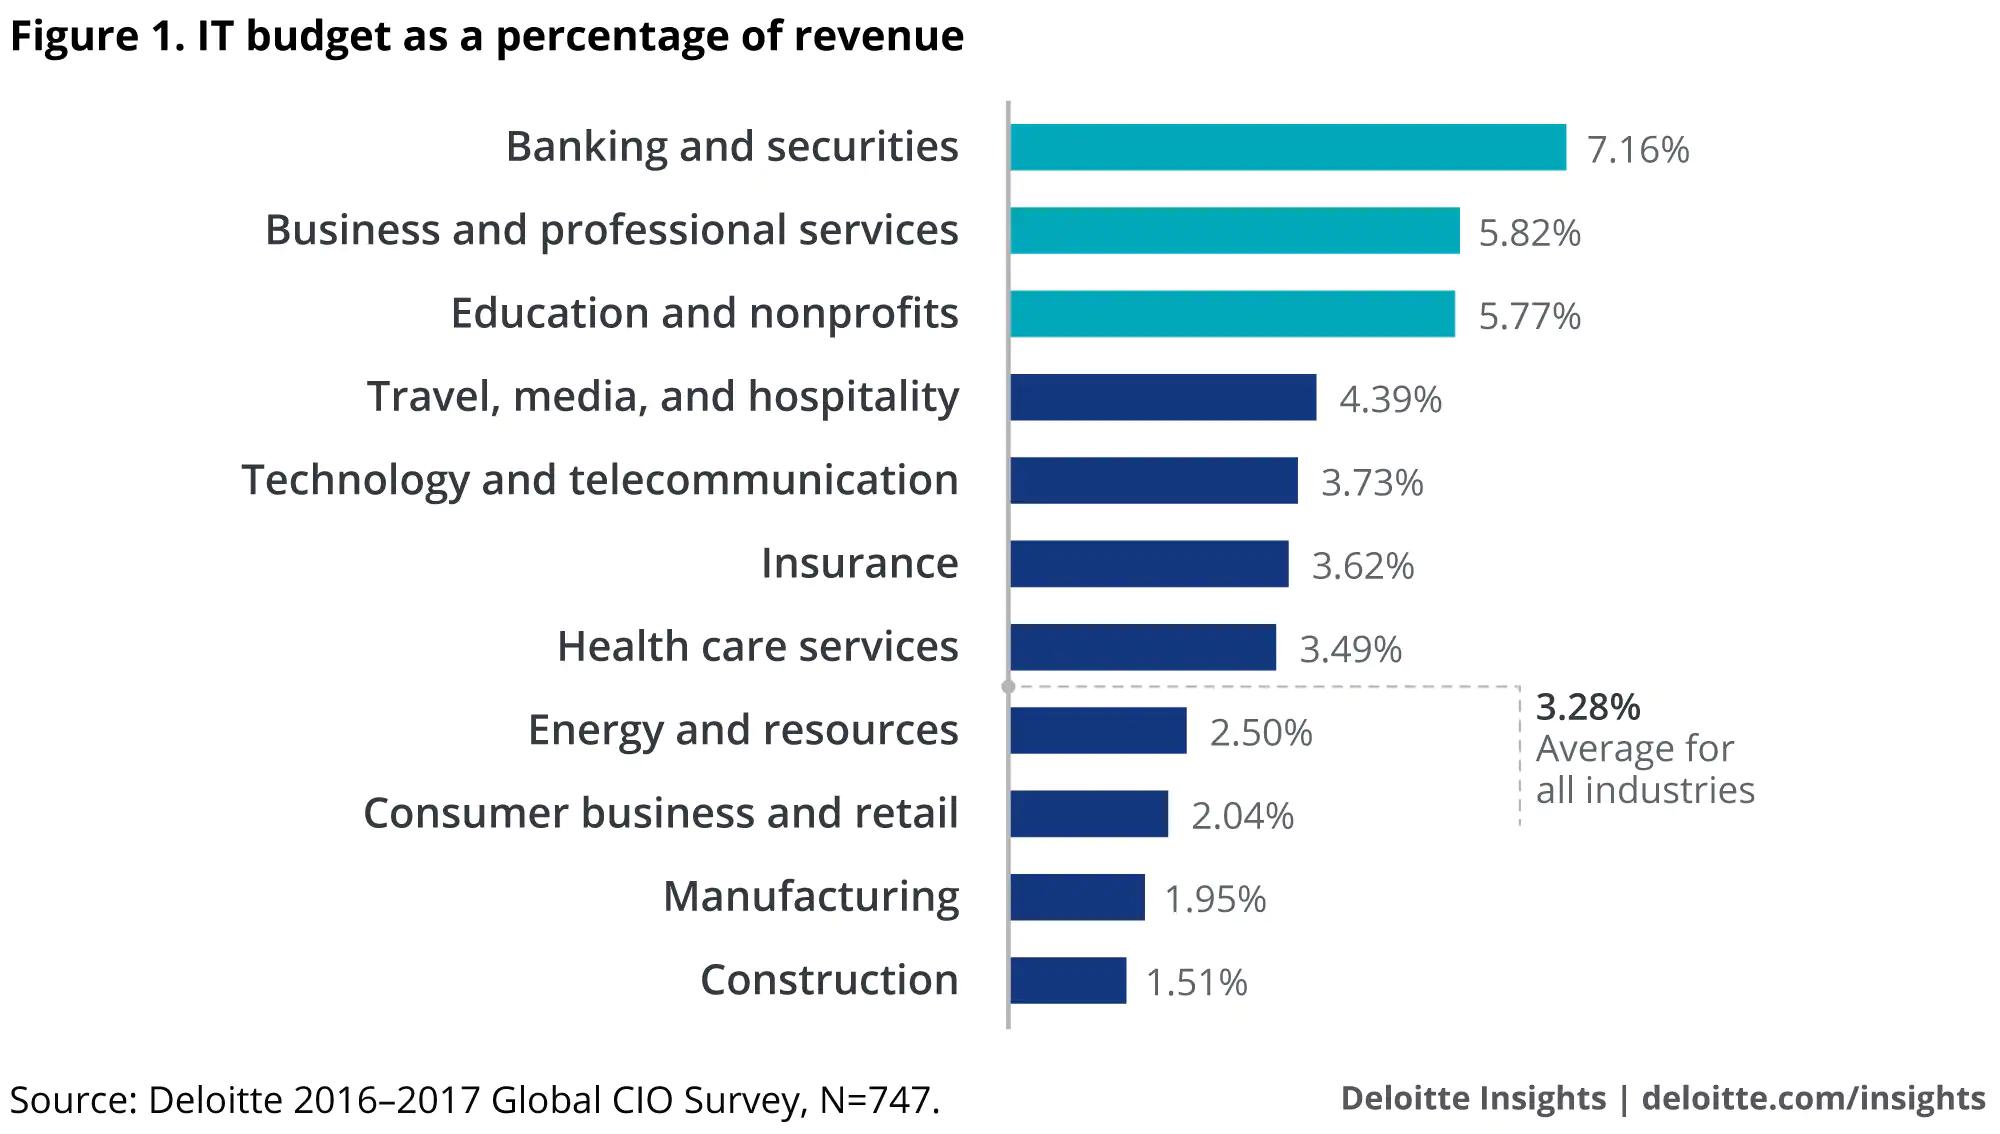 AEC Industry Cloud Budget Technology - Deloitte Data Analysis